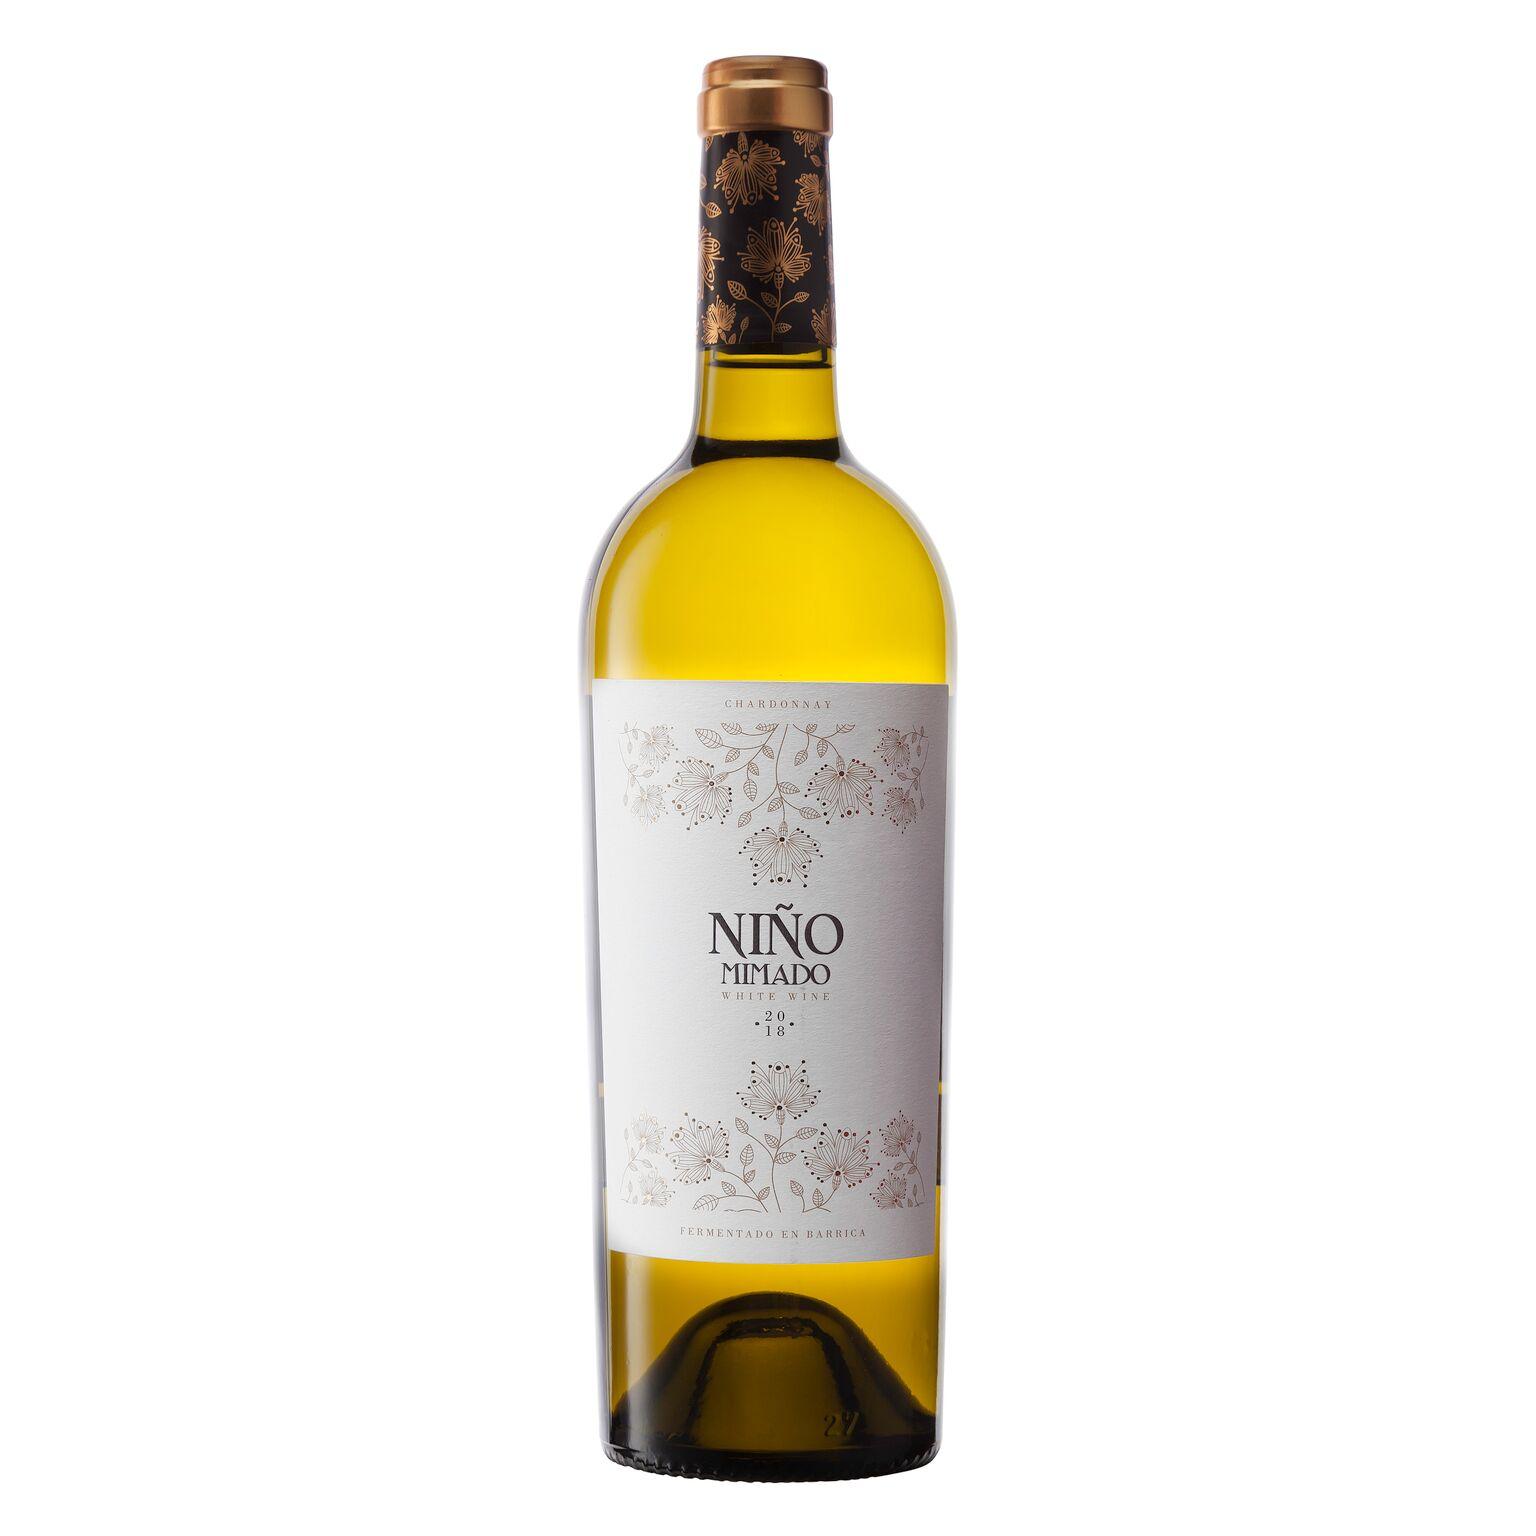 Nino Mimado Chardonnay Barrel Fermented